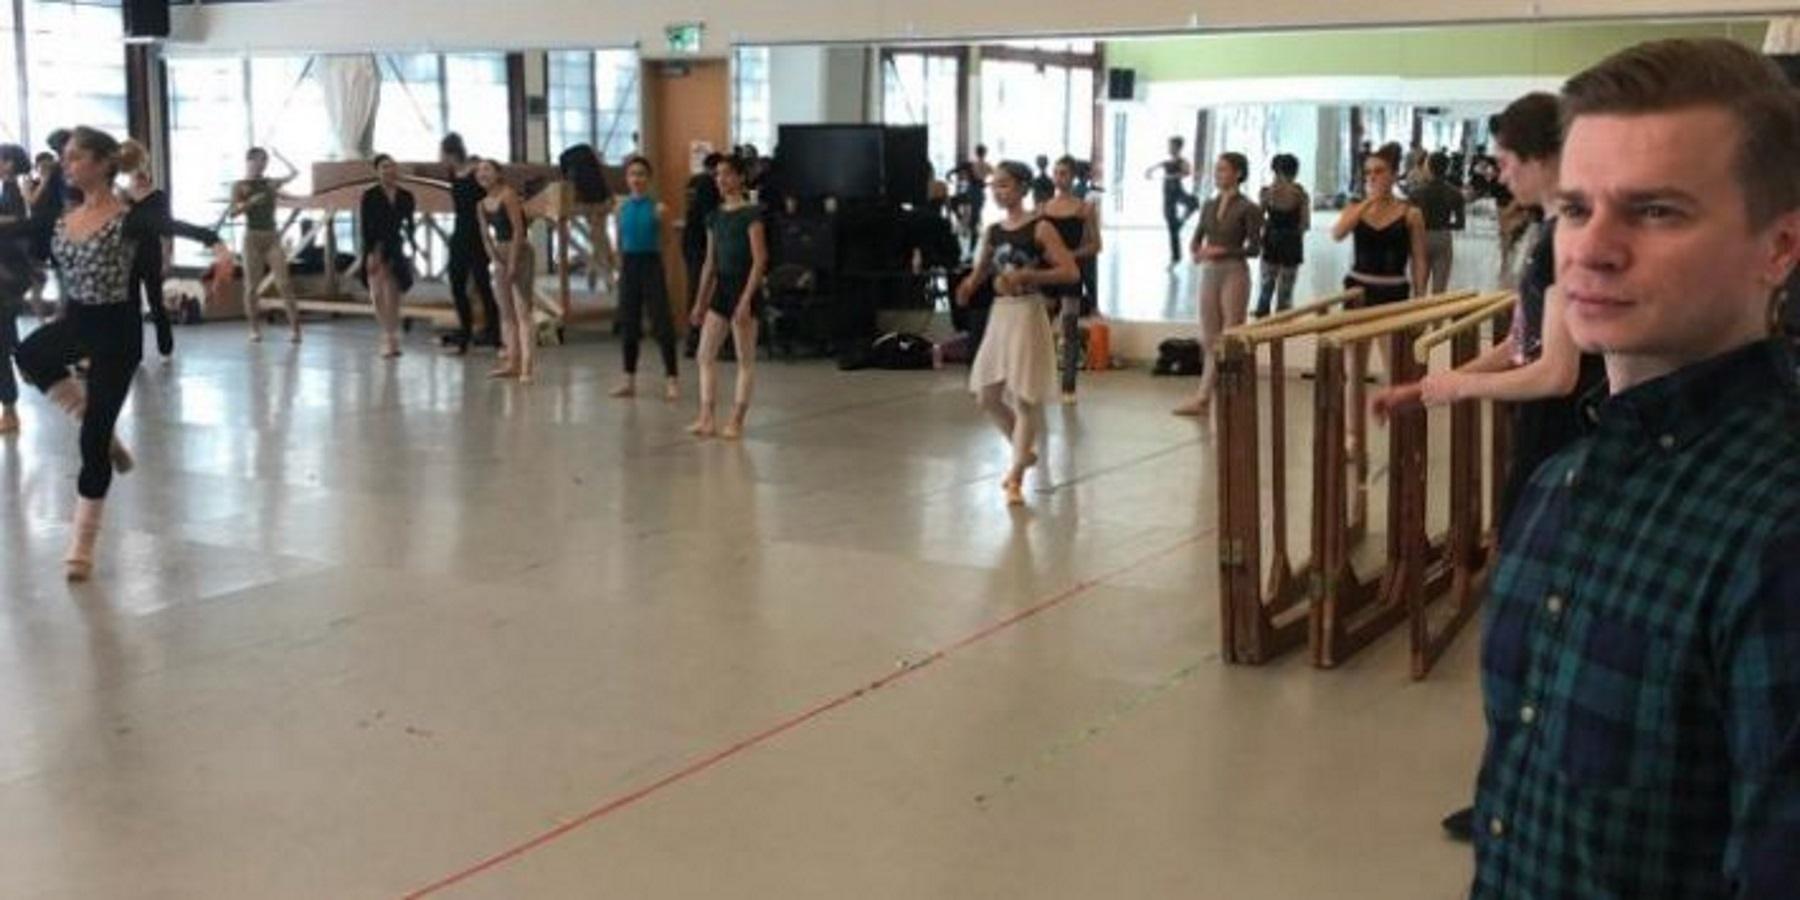 Atlanta Ballet rehearsal